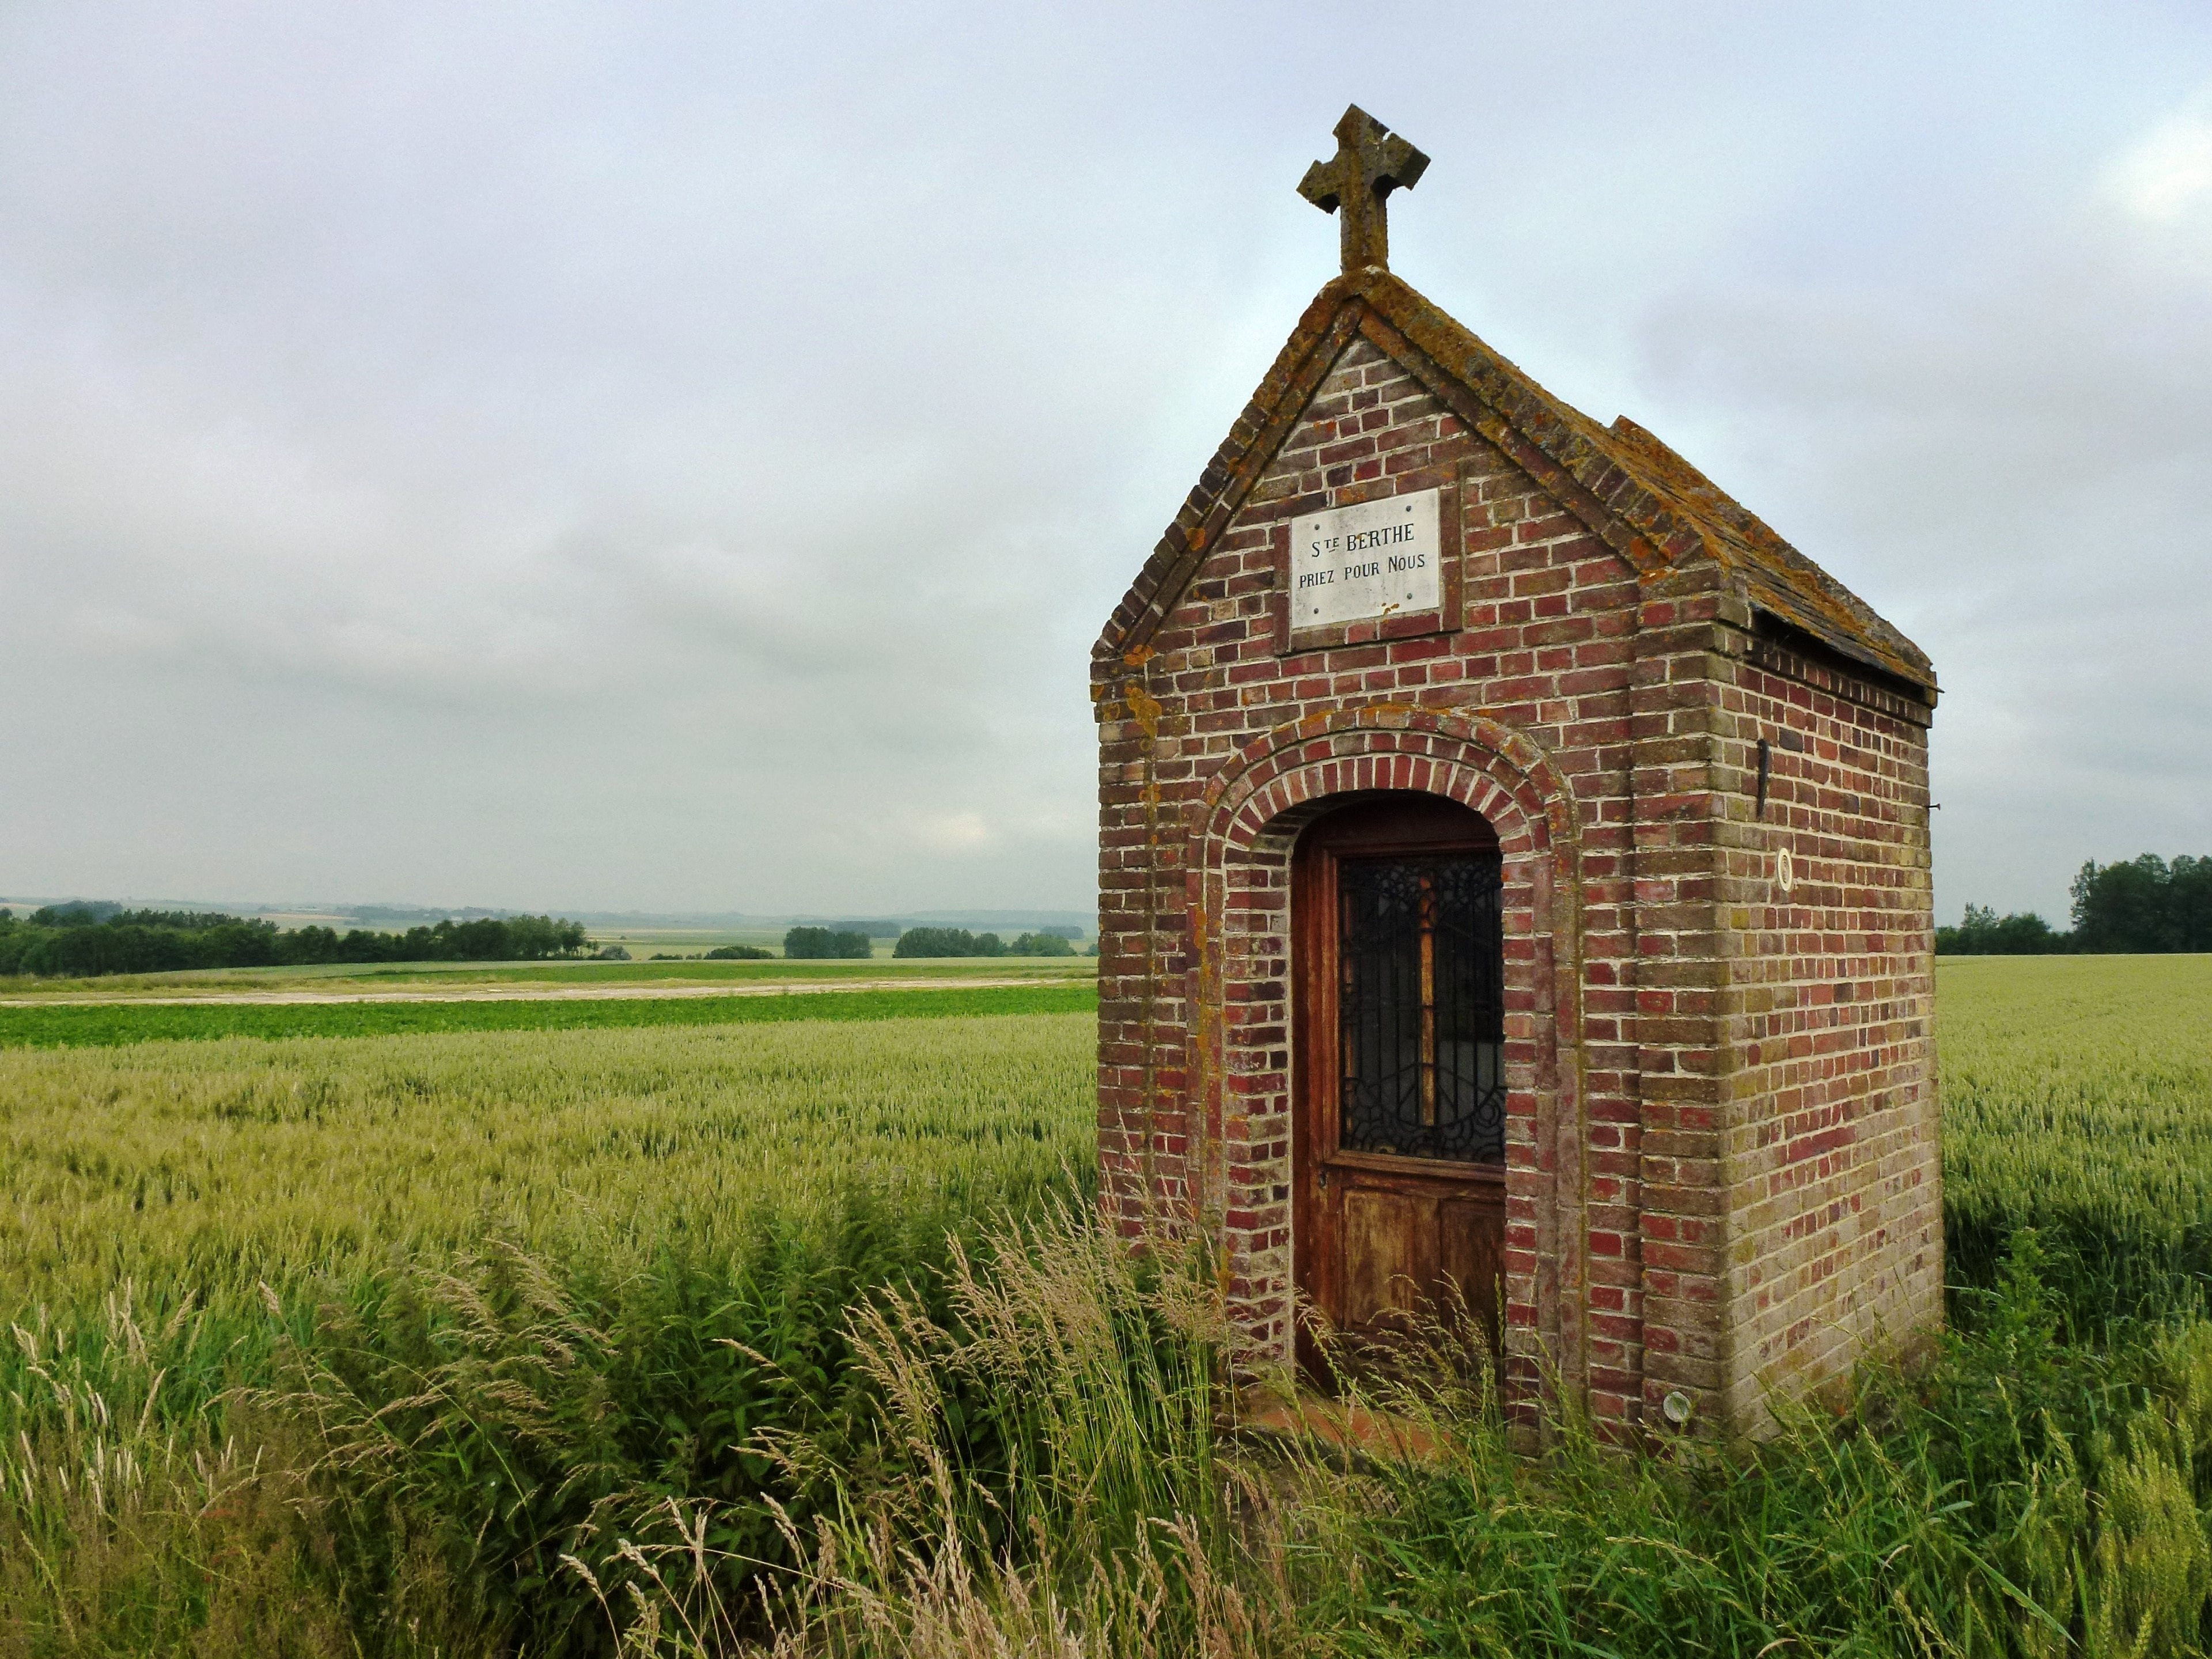 Béthune-Bruay - Artois-Lys Romane, Pas-de-Calais, France